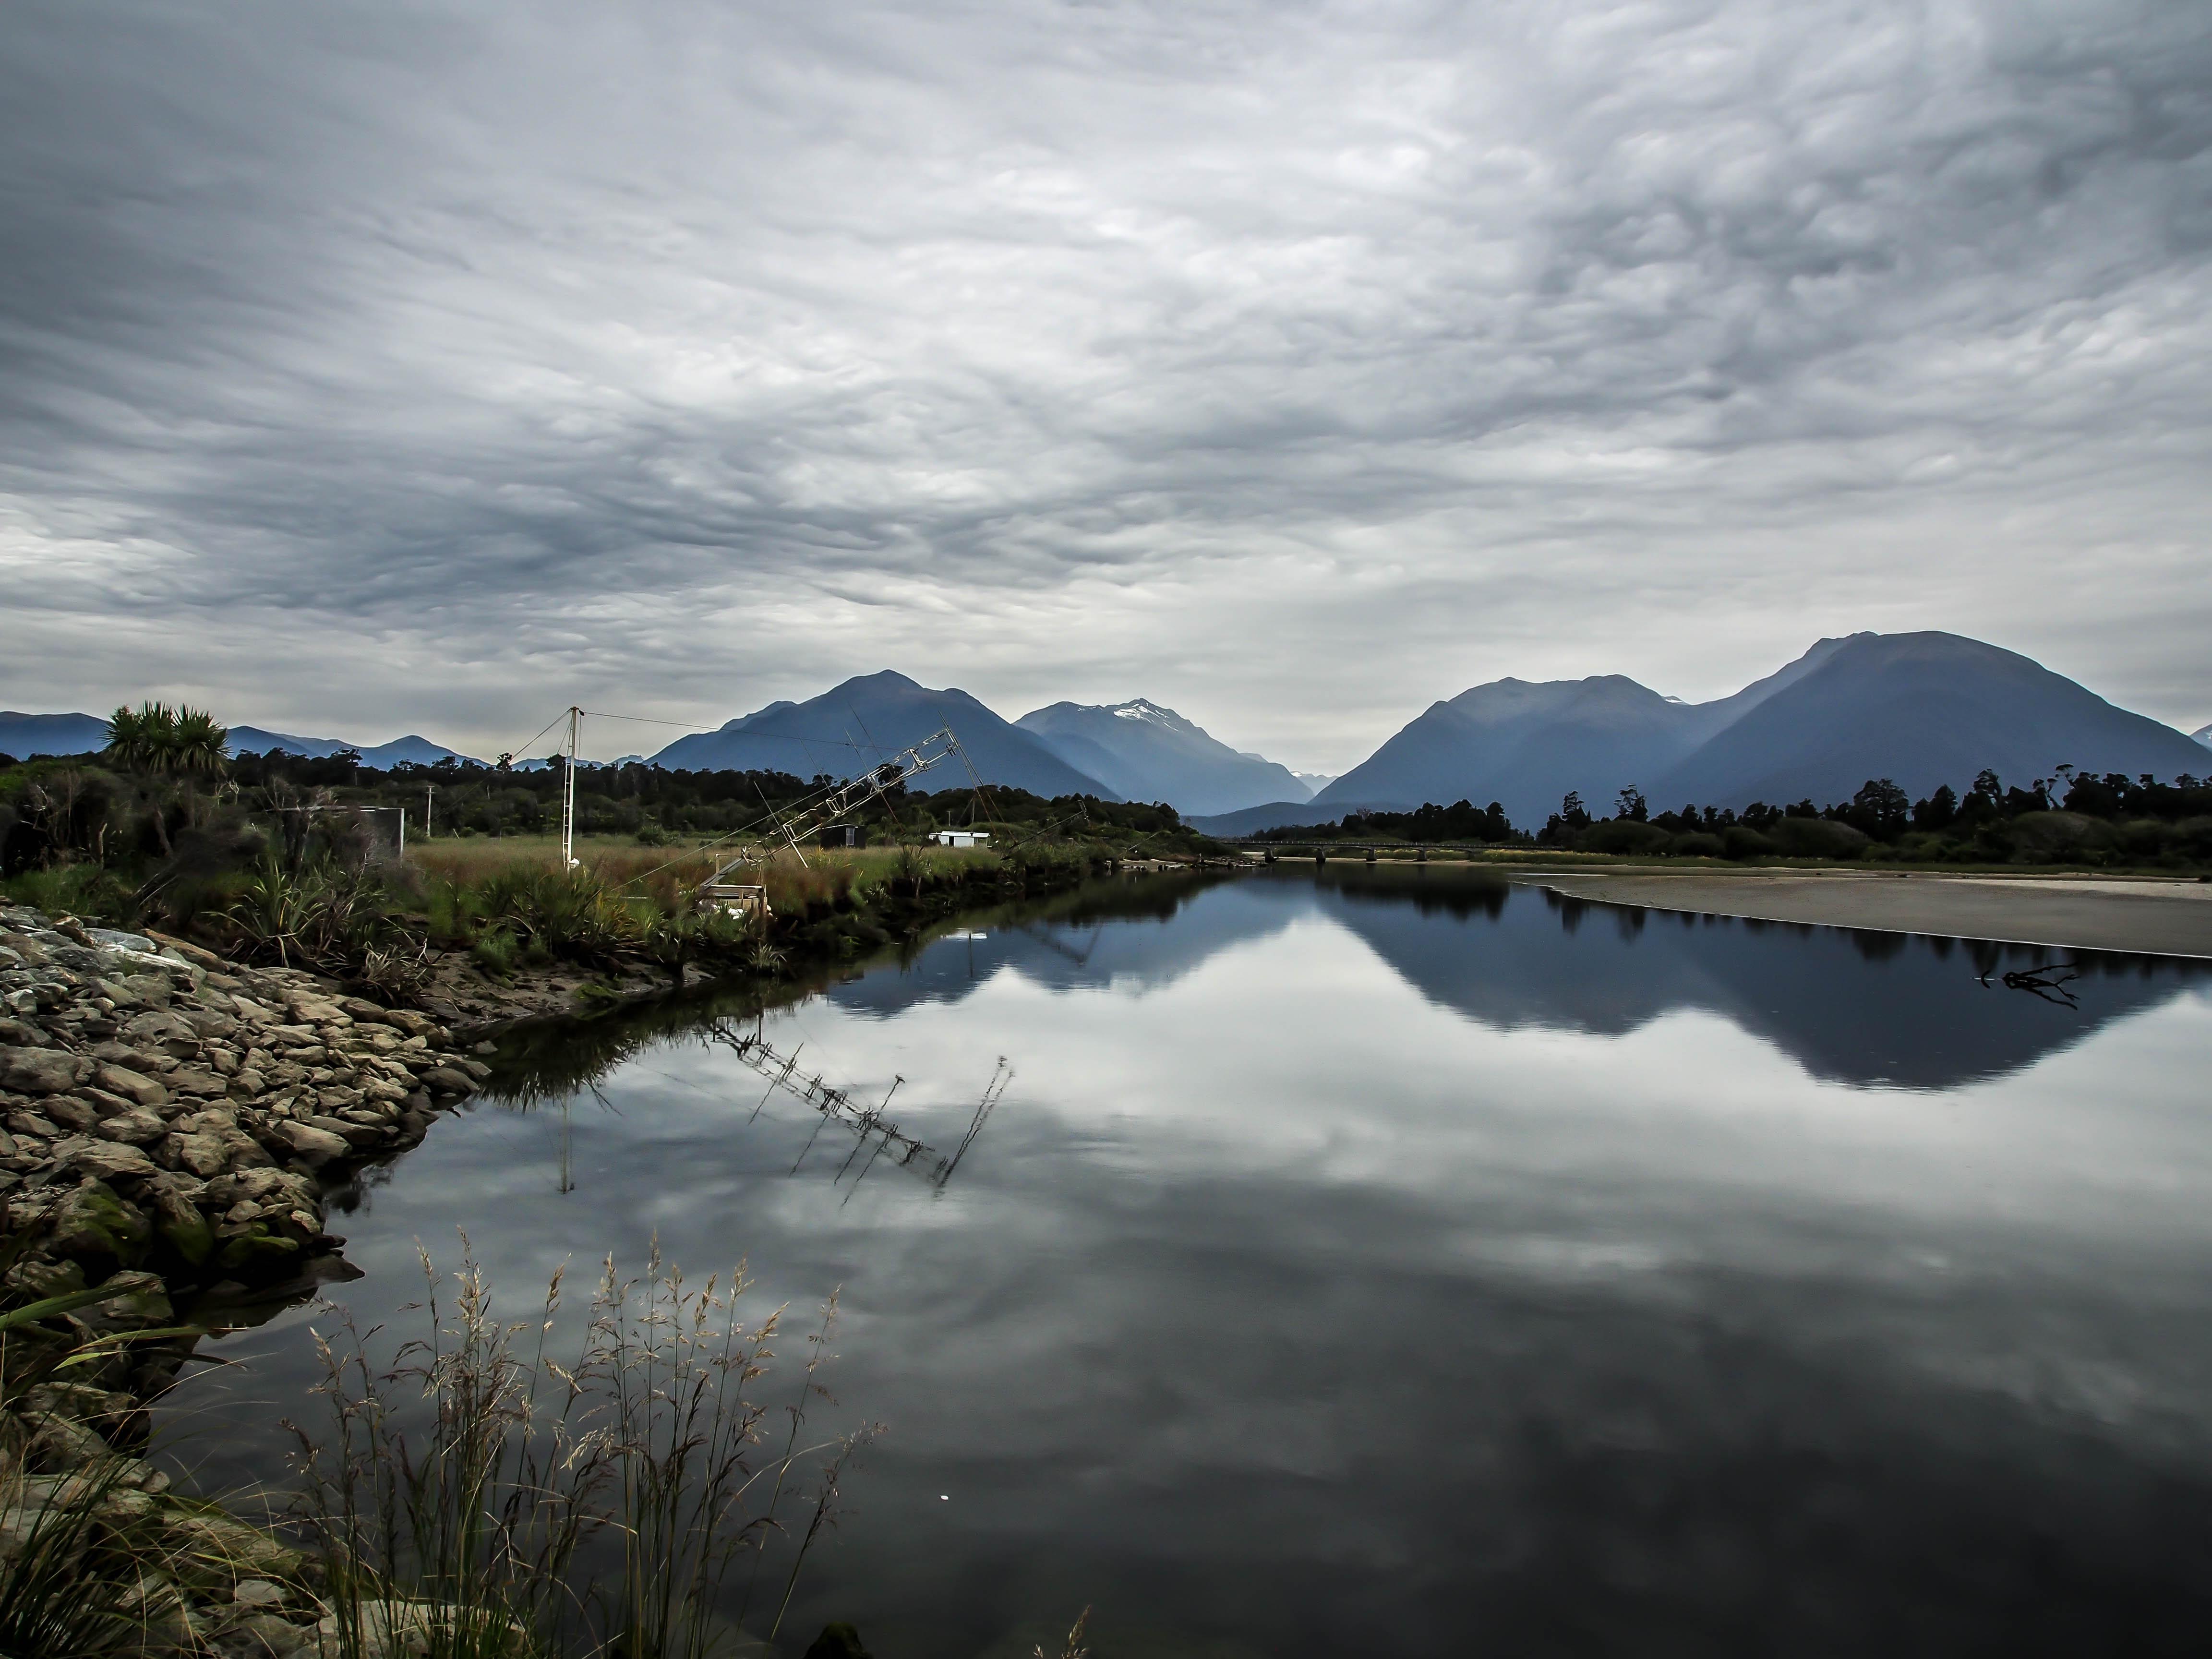 Moody Skies & Beautiful Reflections